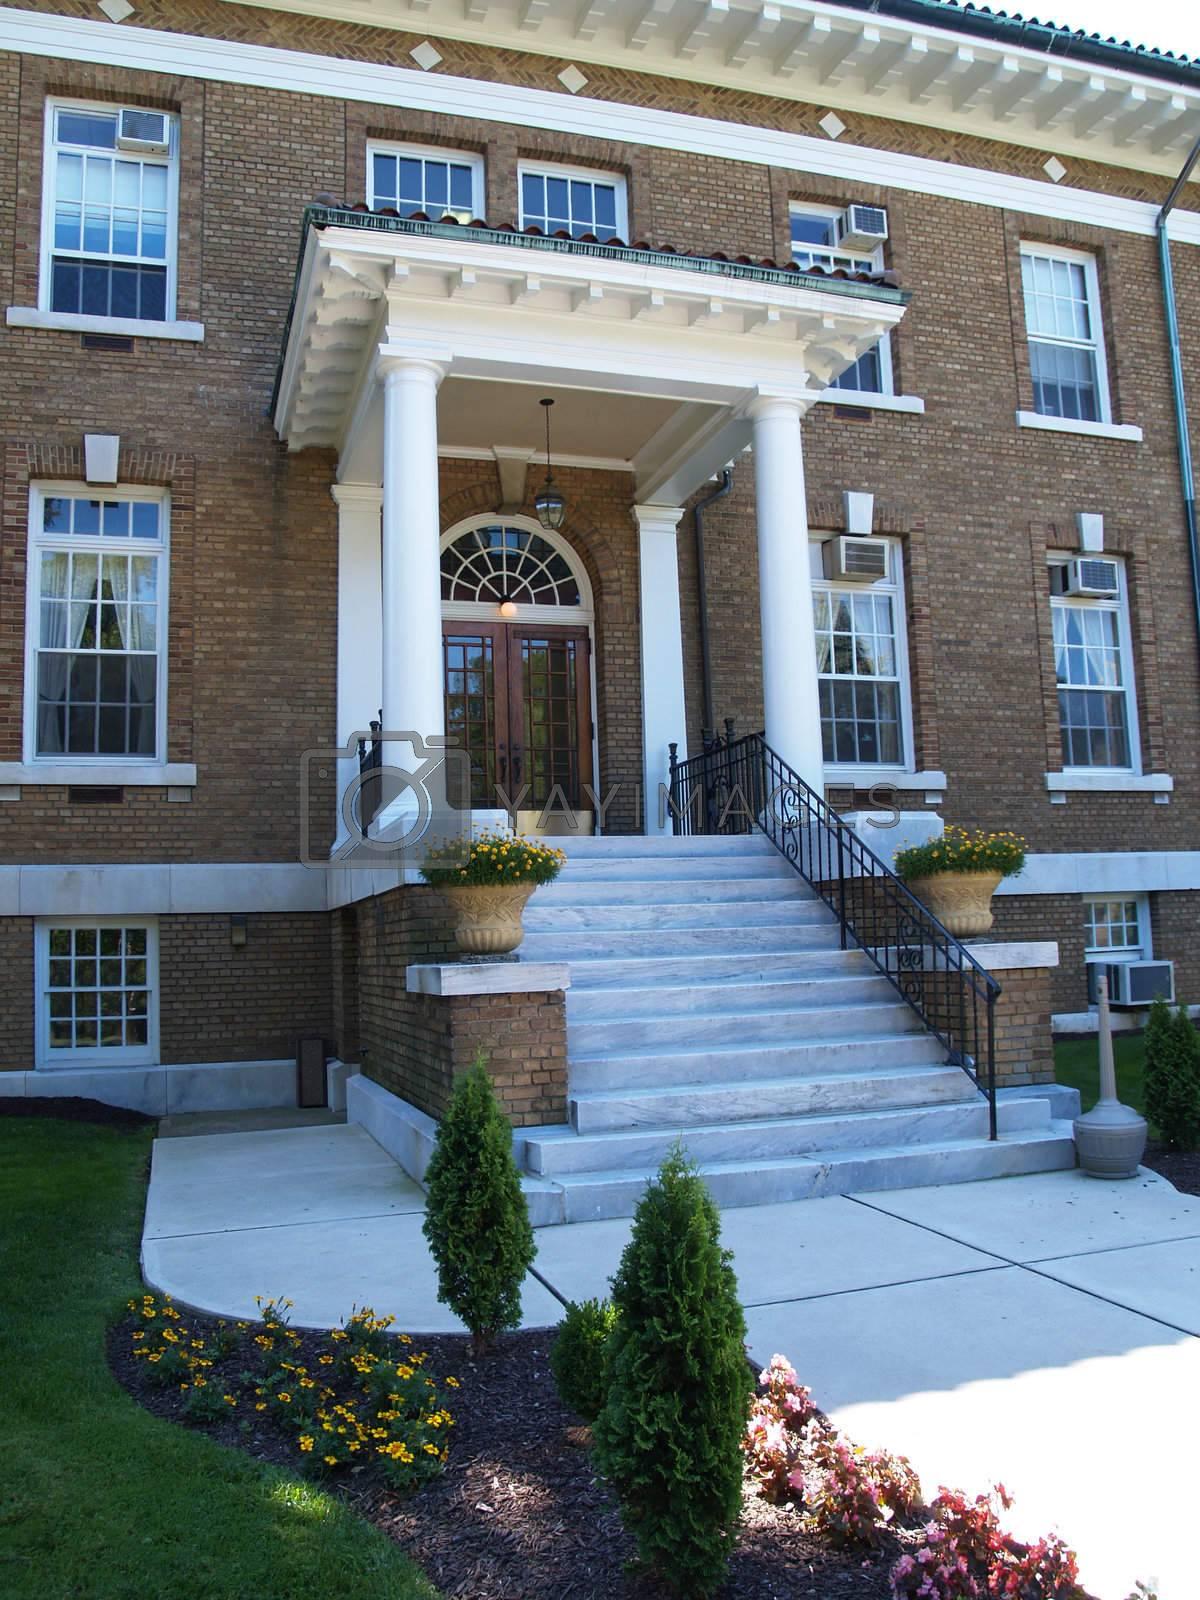 Royalty free image of Blaney Hall, Cedar Crest College by cfarmer